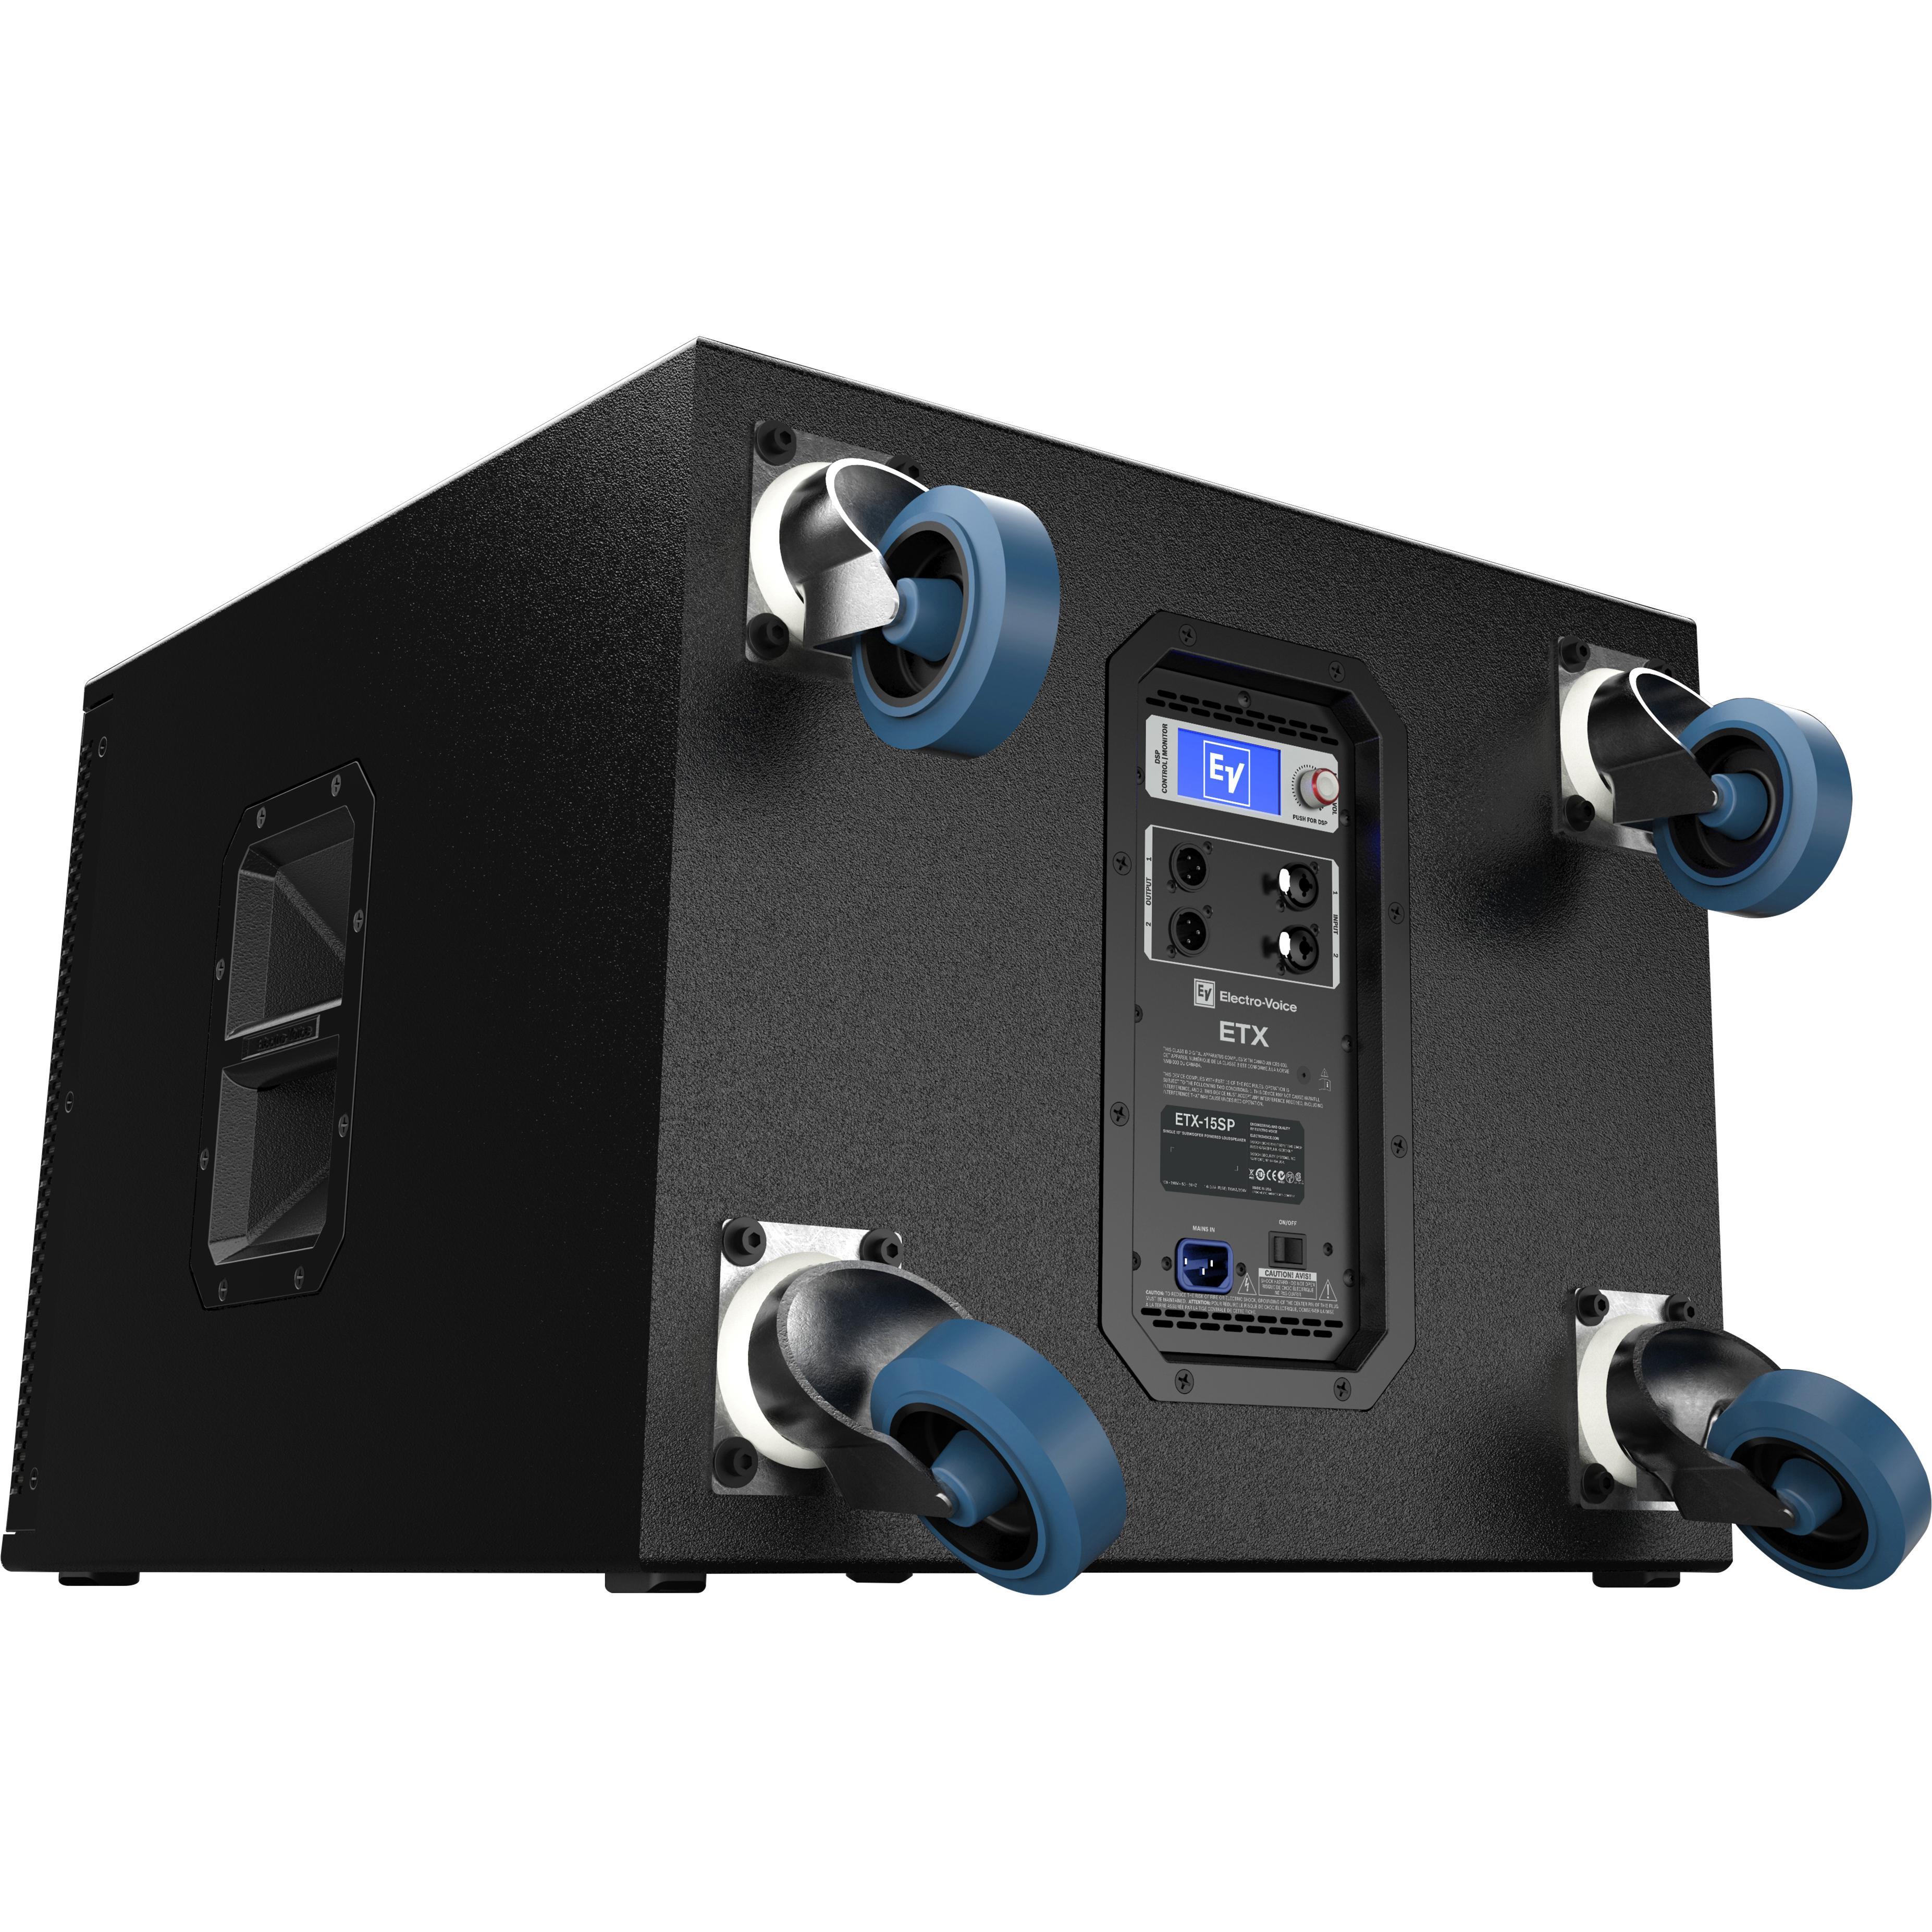 electro voice etx 15sp 15 1800w powered subwoofer musical instruments. Black Bedroom Furniture Sets. Home Design Ideas